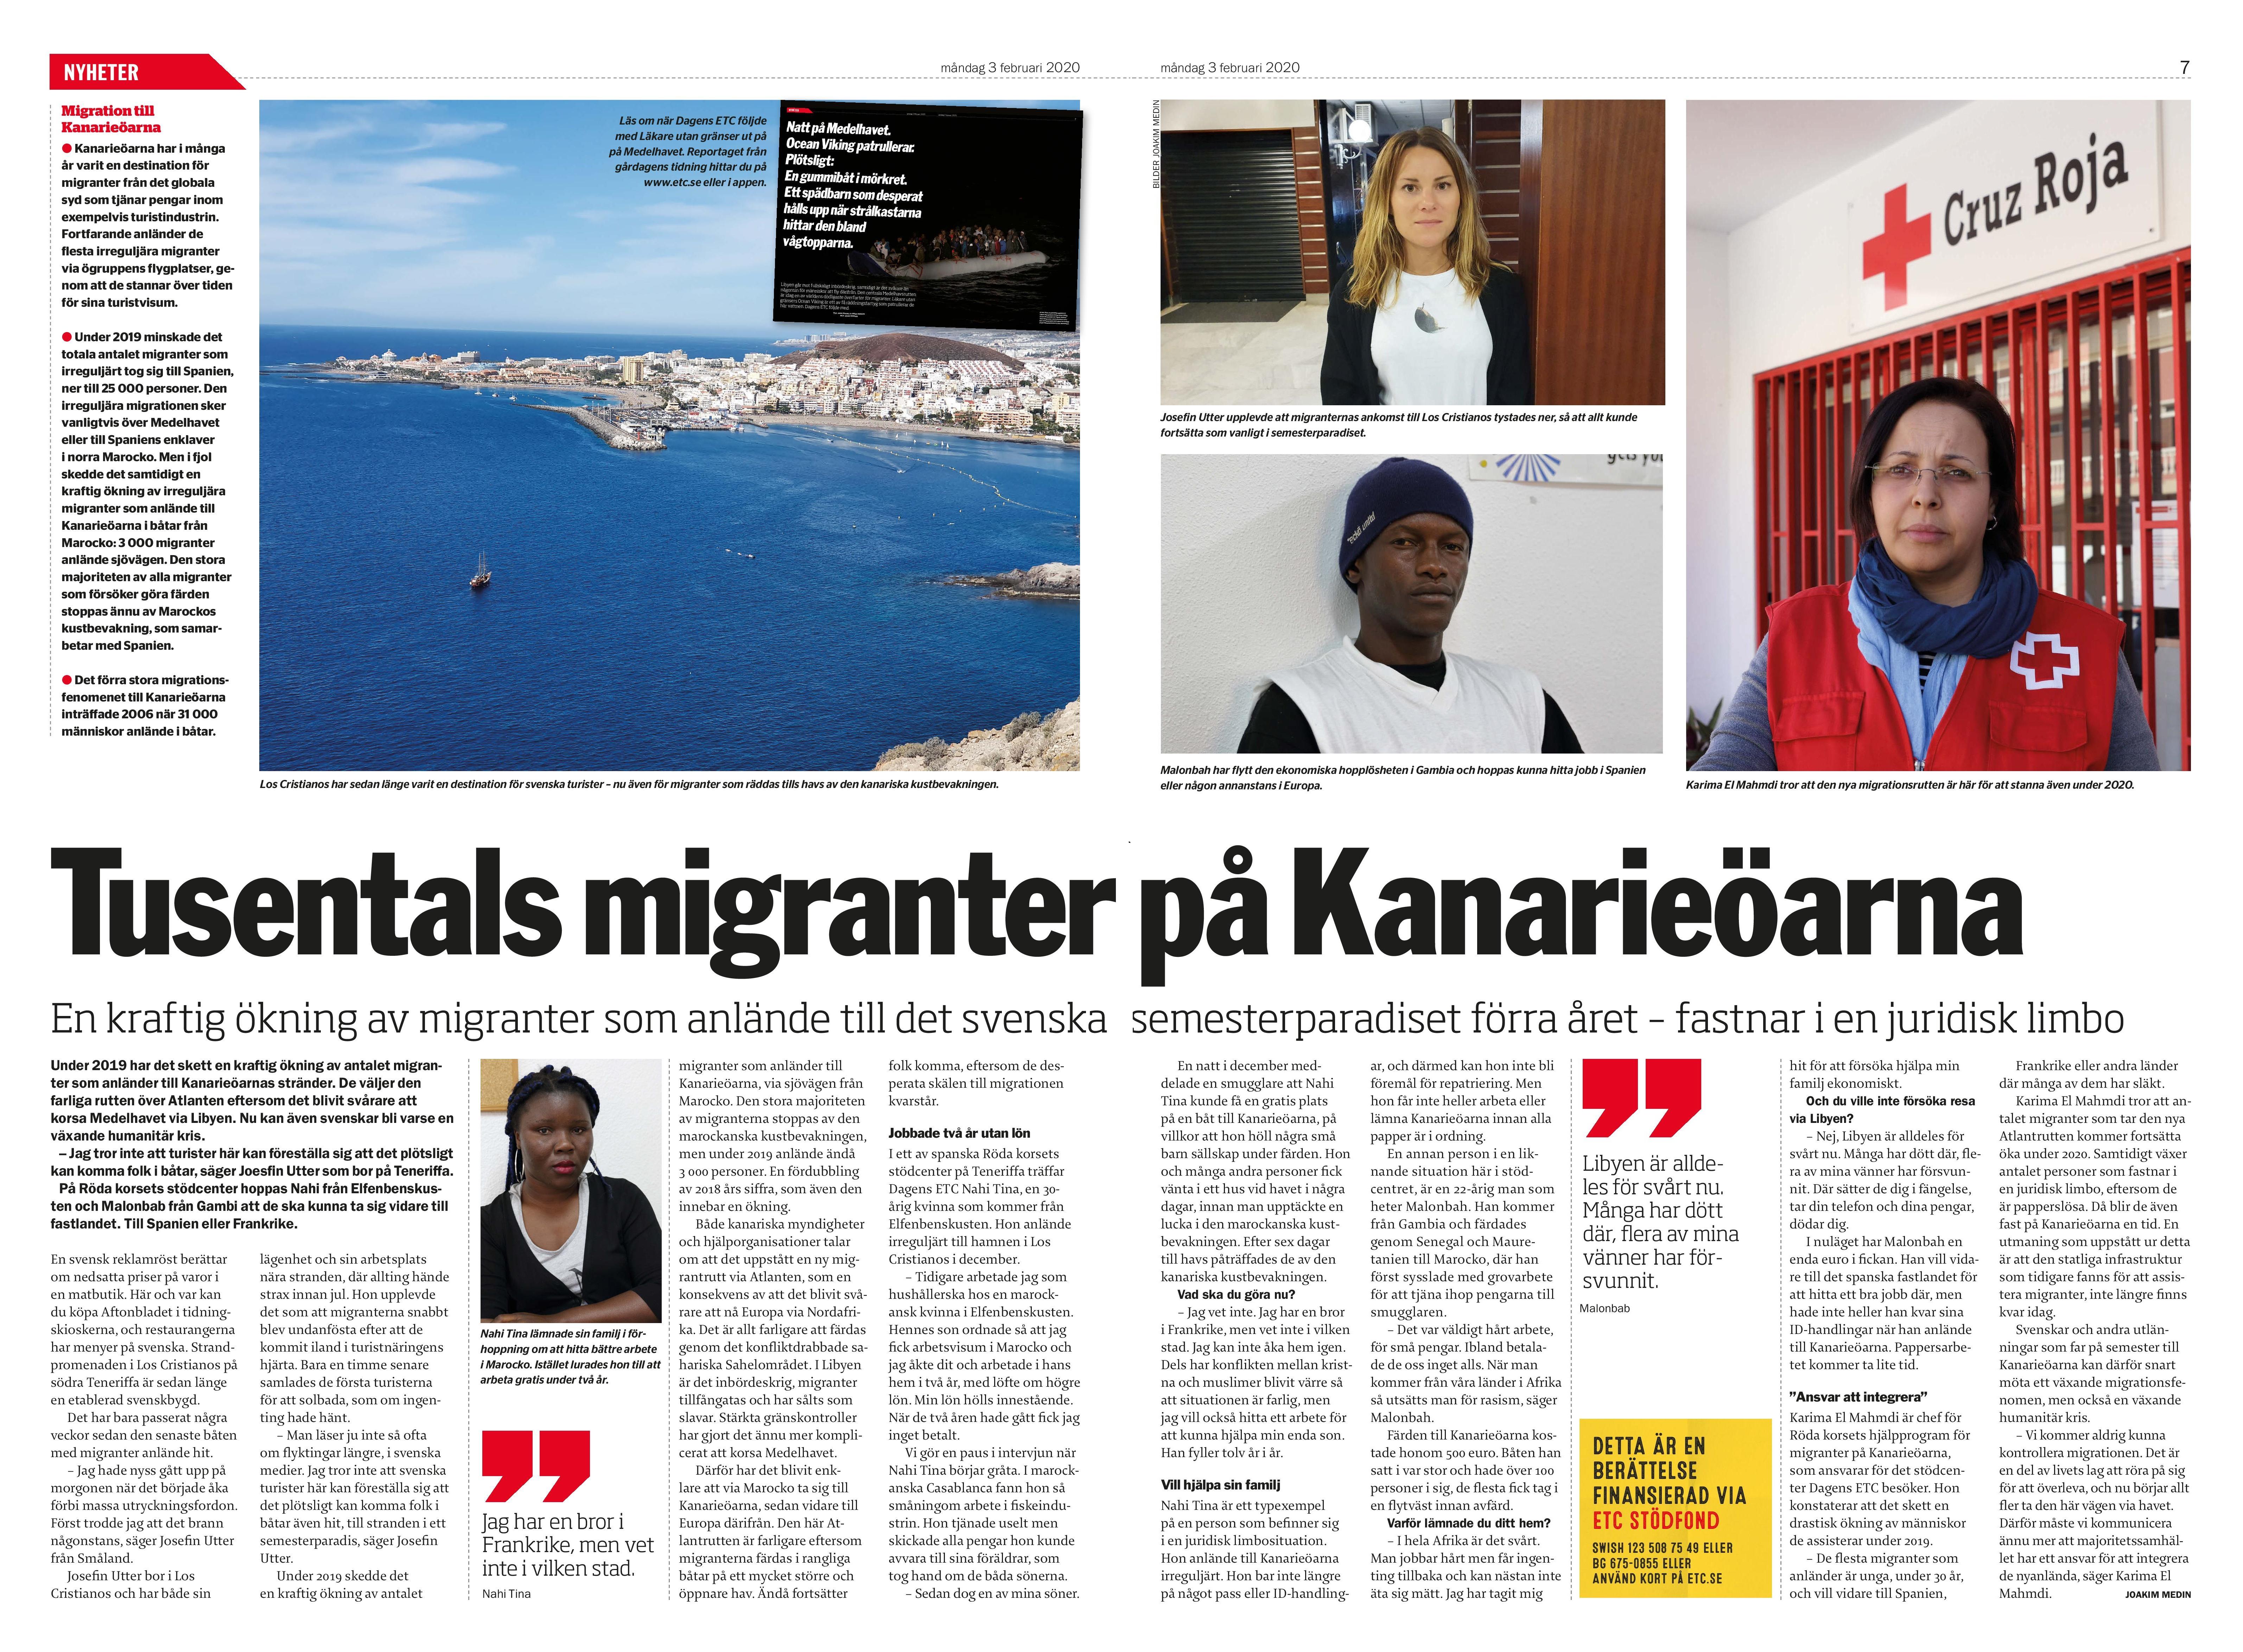 Kanarieöarna, Dagens ETC 2020-02-03